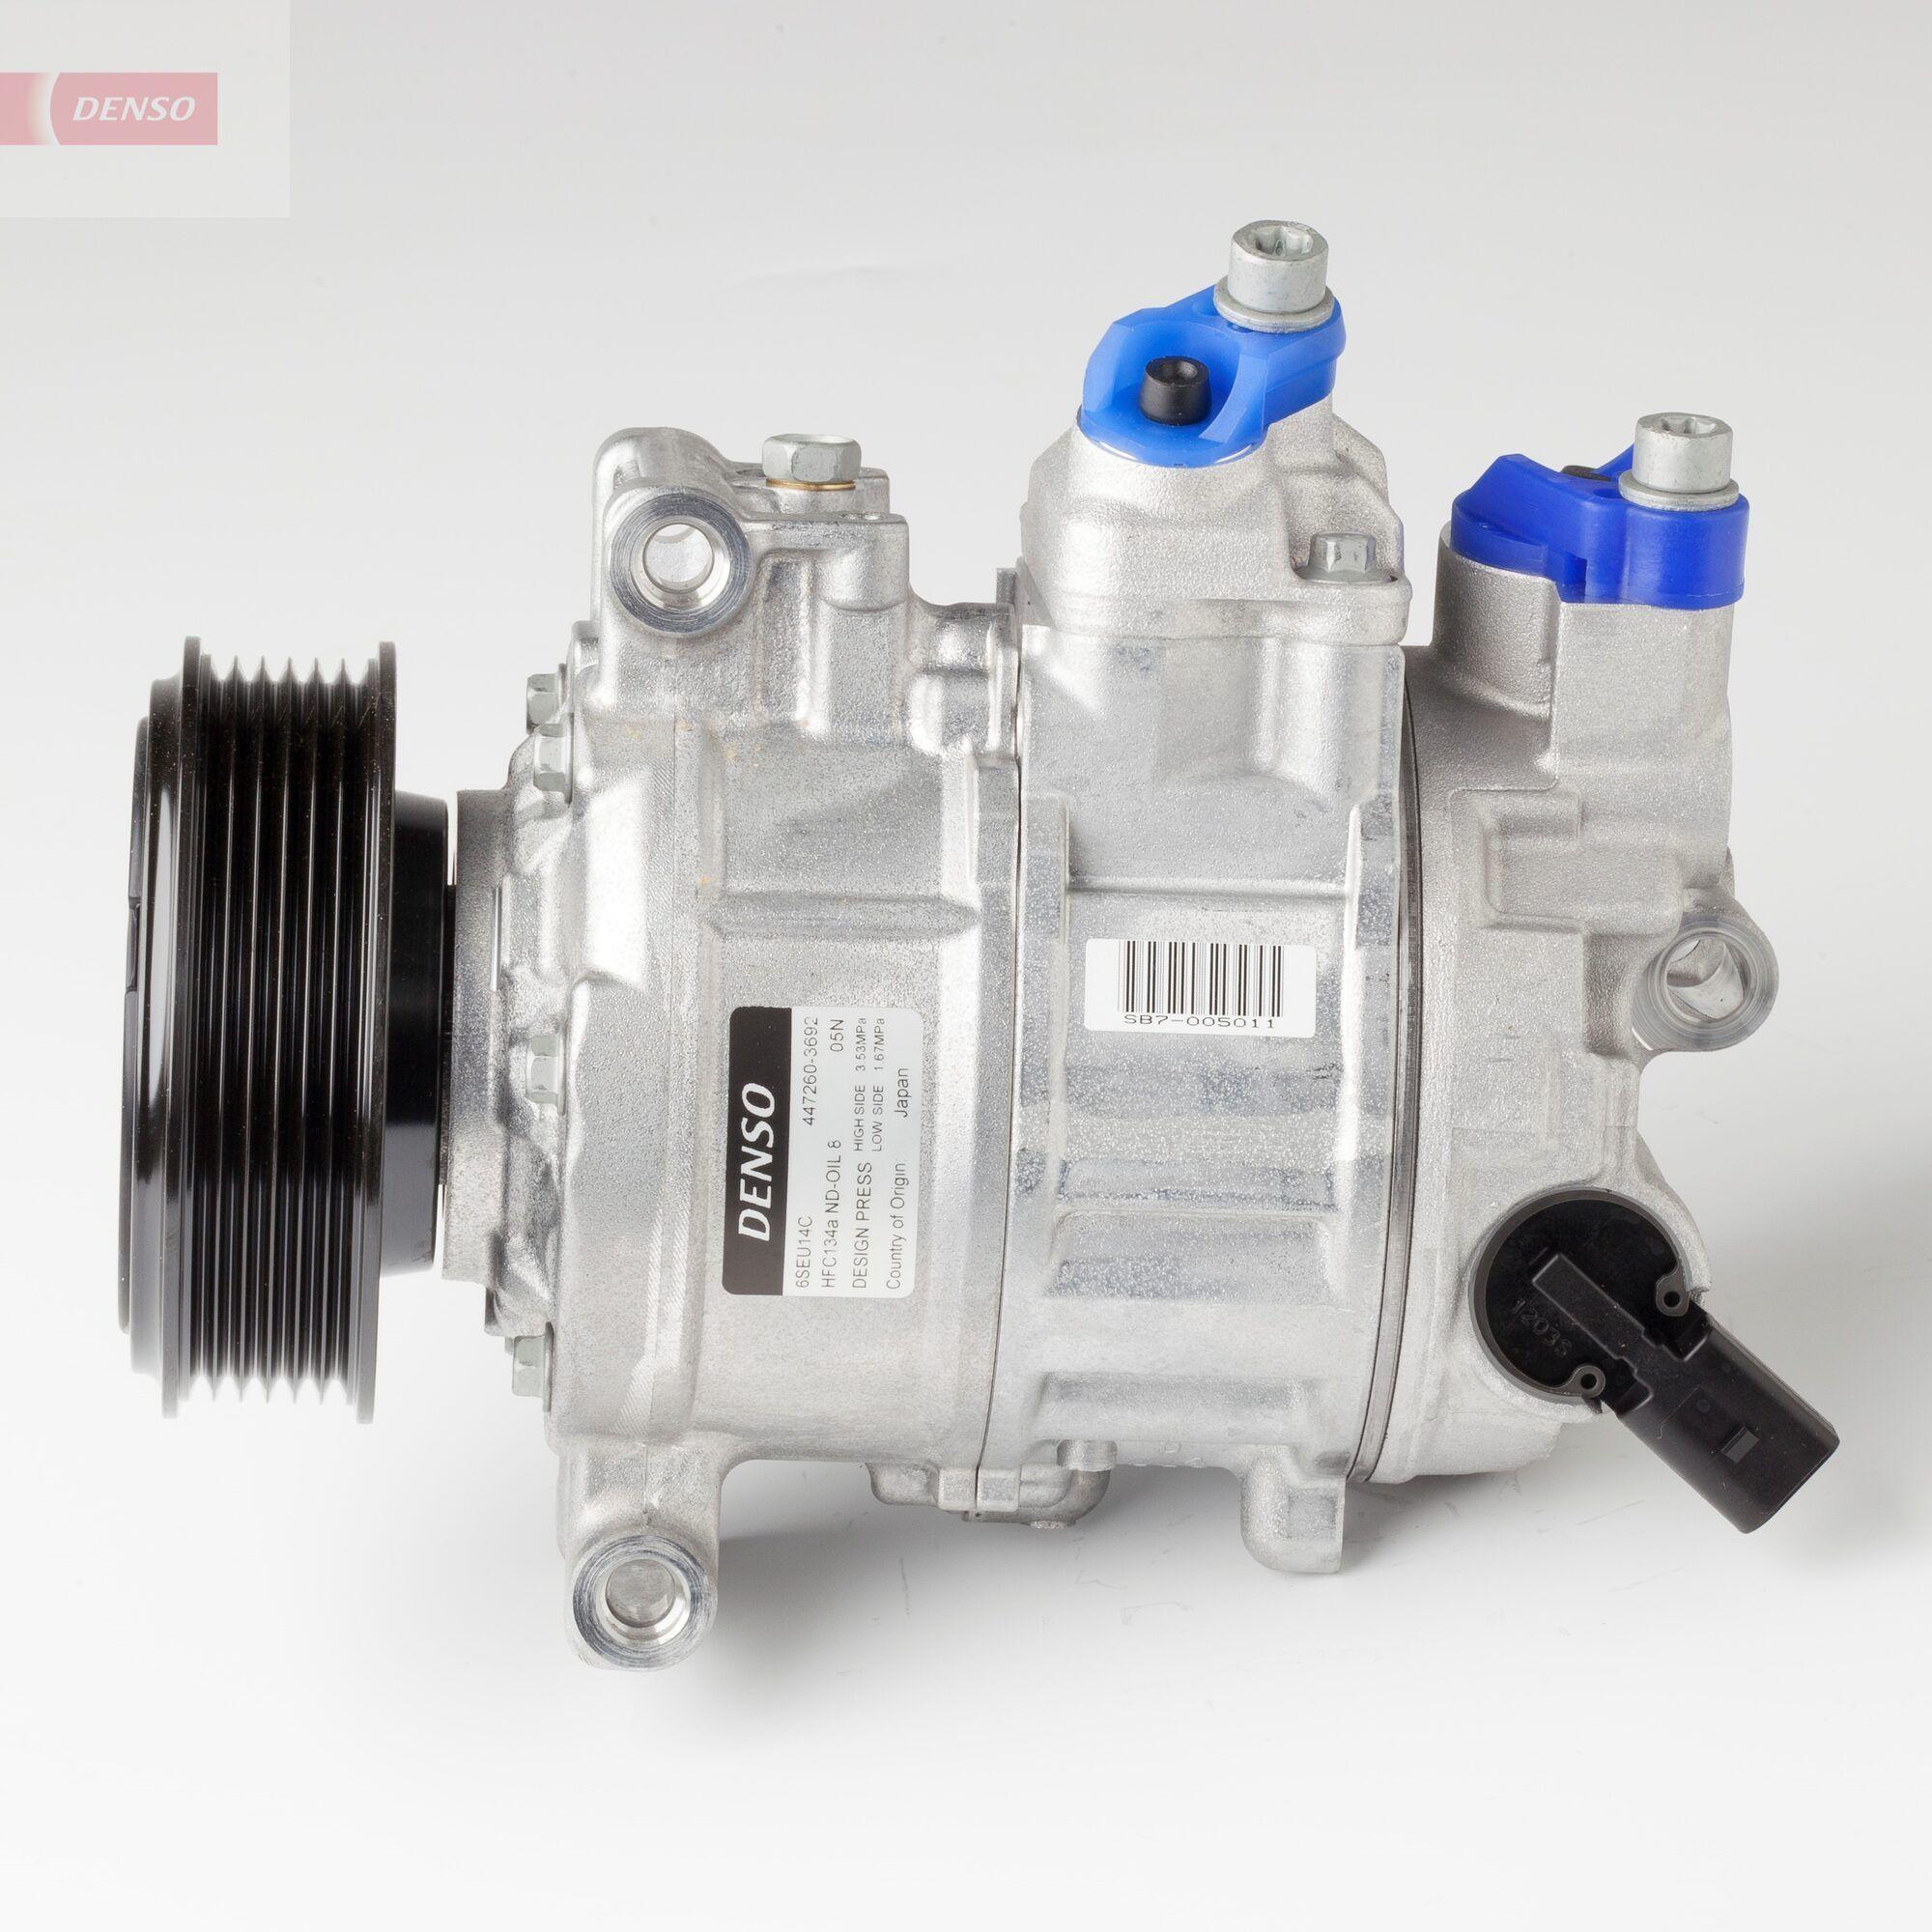 DCP02060 DENSO Klimakompressor Bewertung